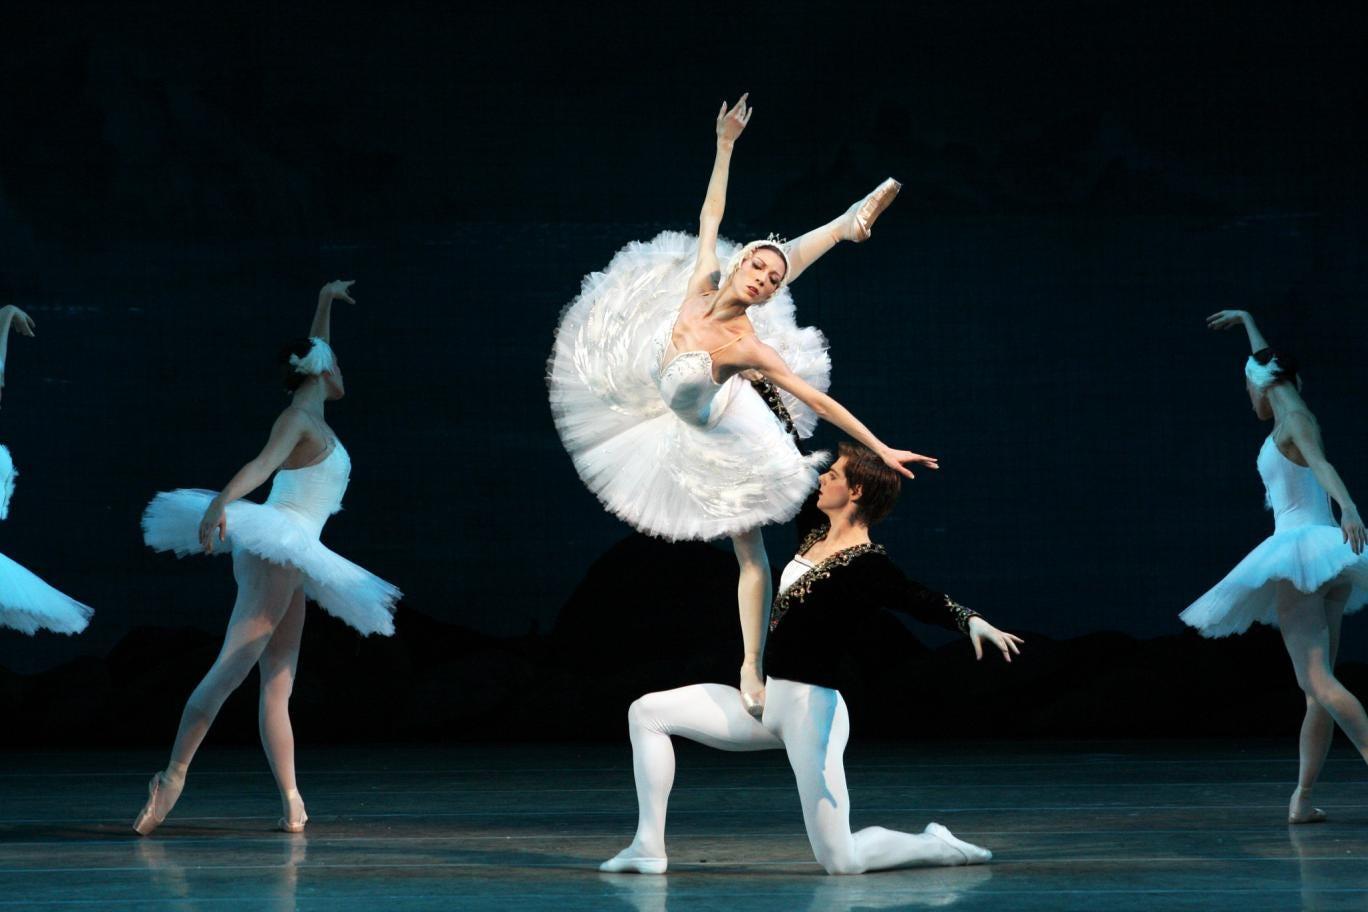 The Mariinsky Ballet perform Swan Lake